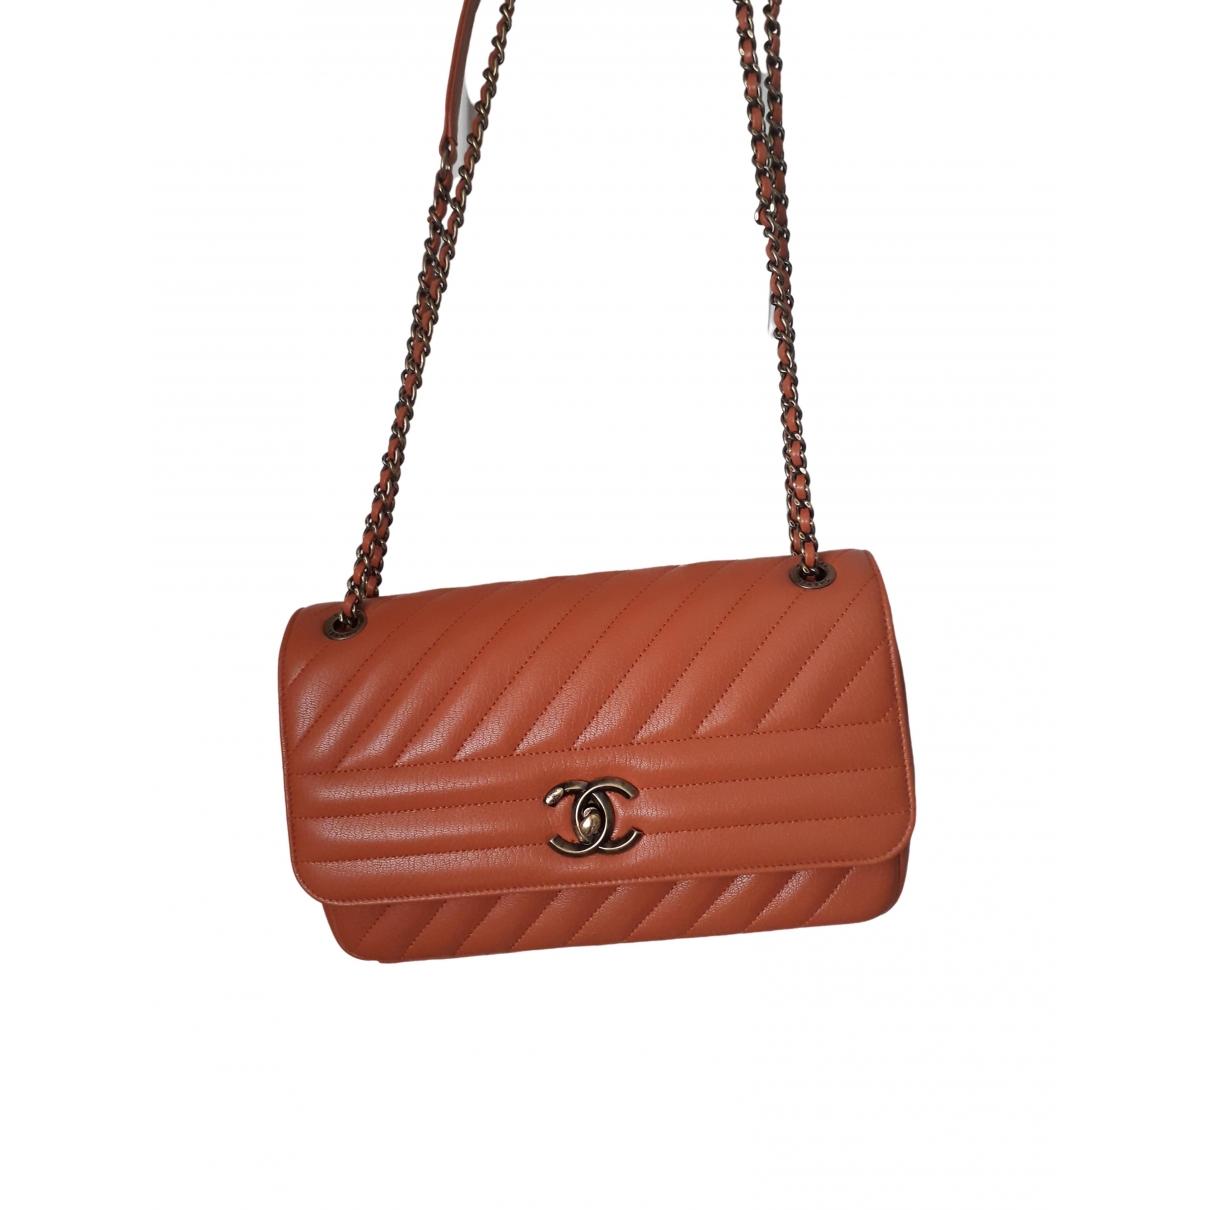 Chanel Timeless/Classique Leather handbag for Women \N